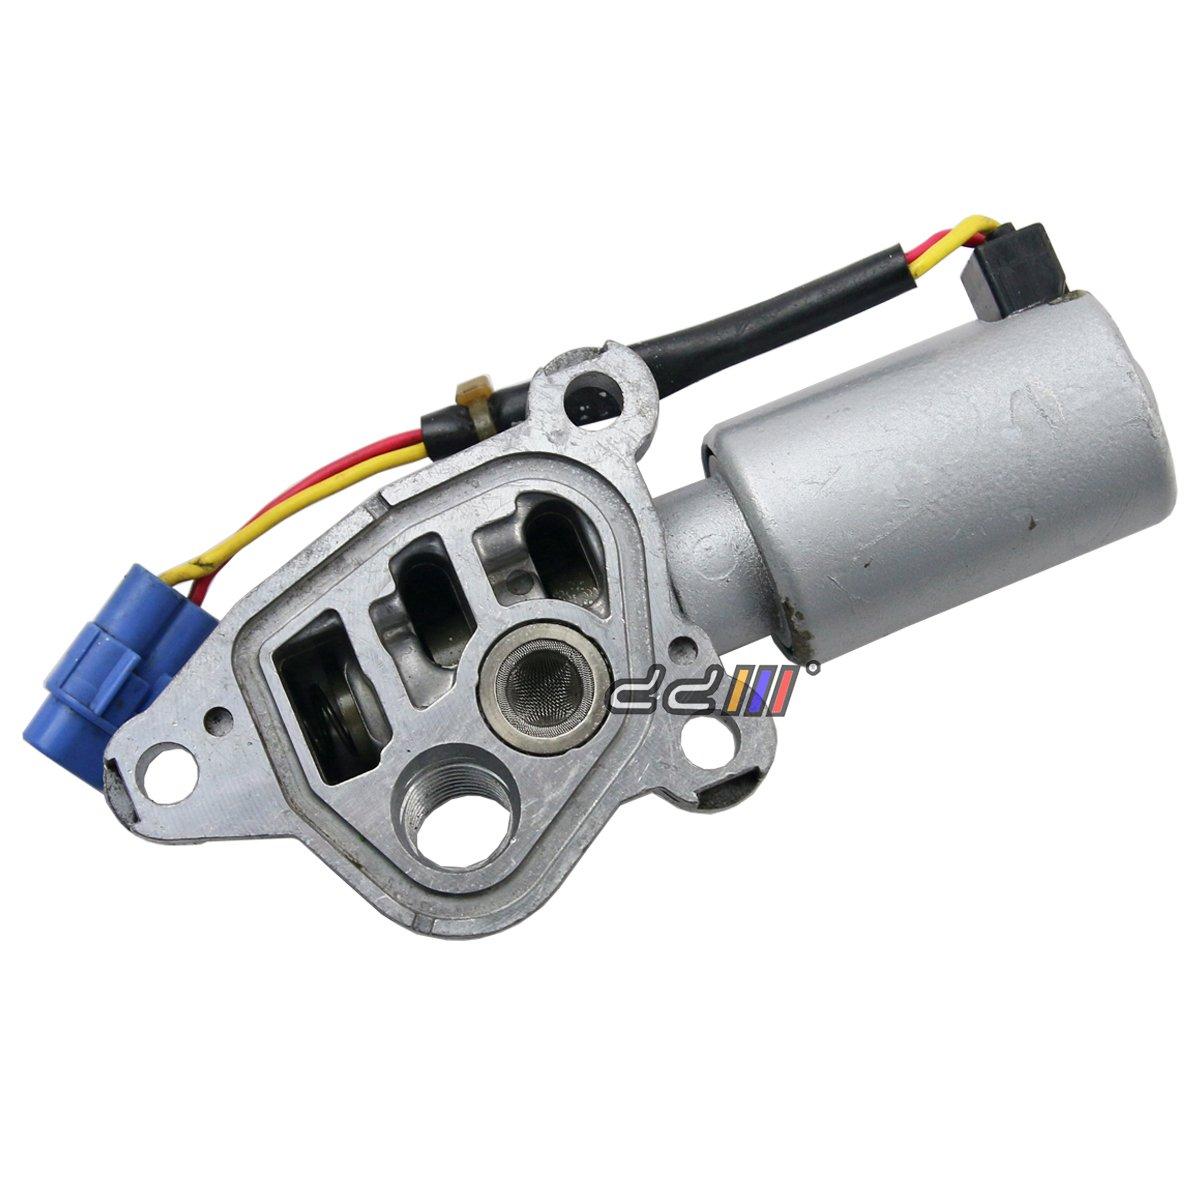 VVT Oil Pump Control Valve Sensor For Suzuki Jimny Swift Vitara SX4 16550-69GE3